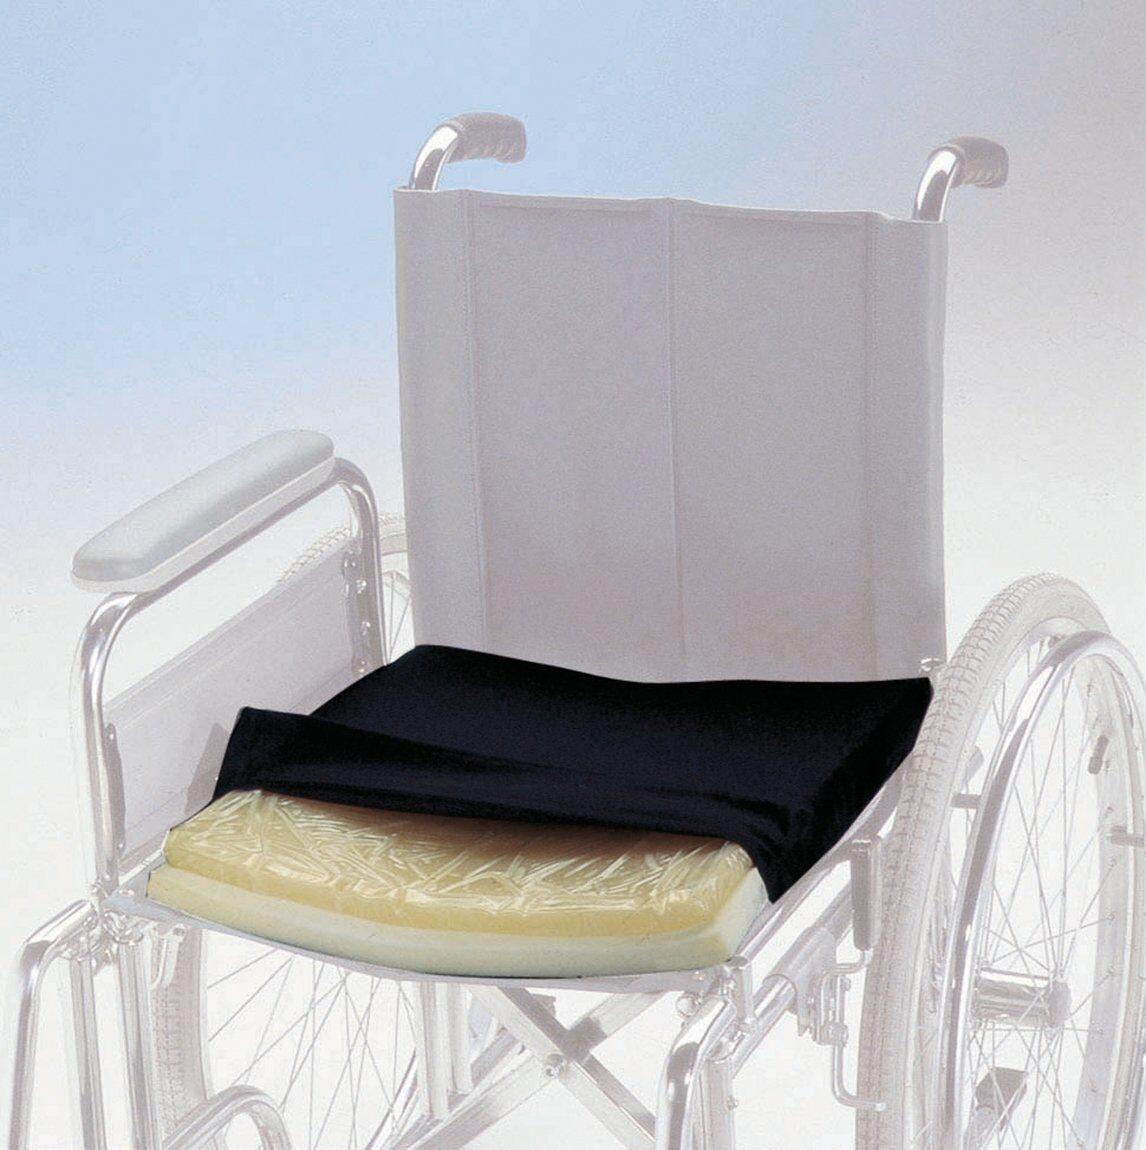 chinesport cuscino antidecubito in gel fluido per sedia a rotelle